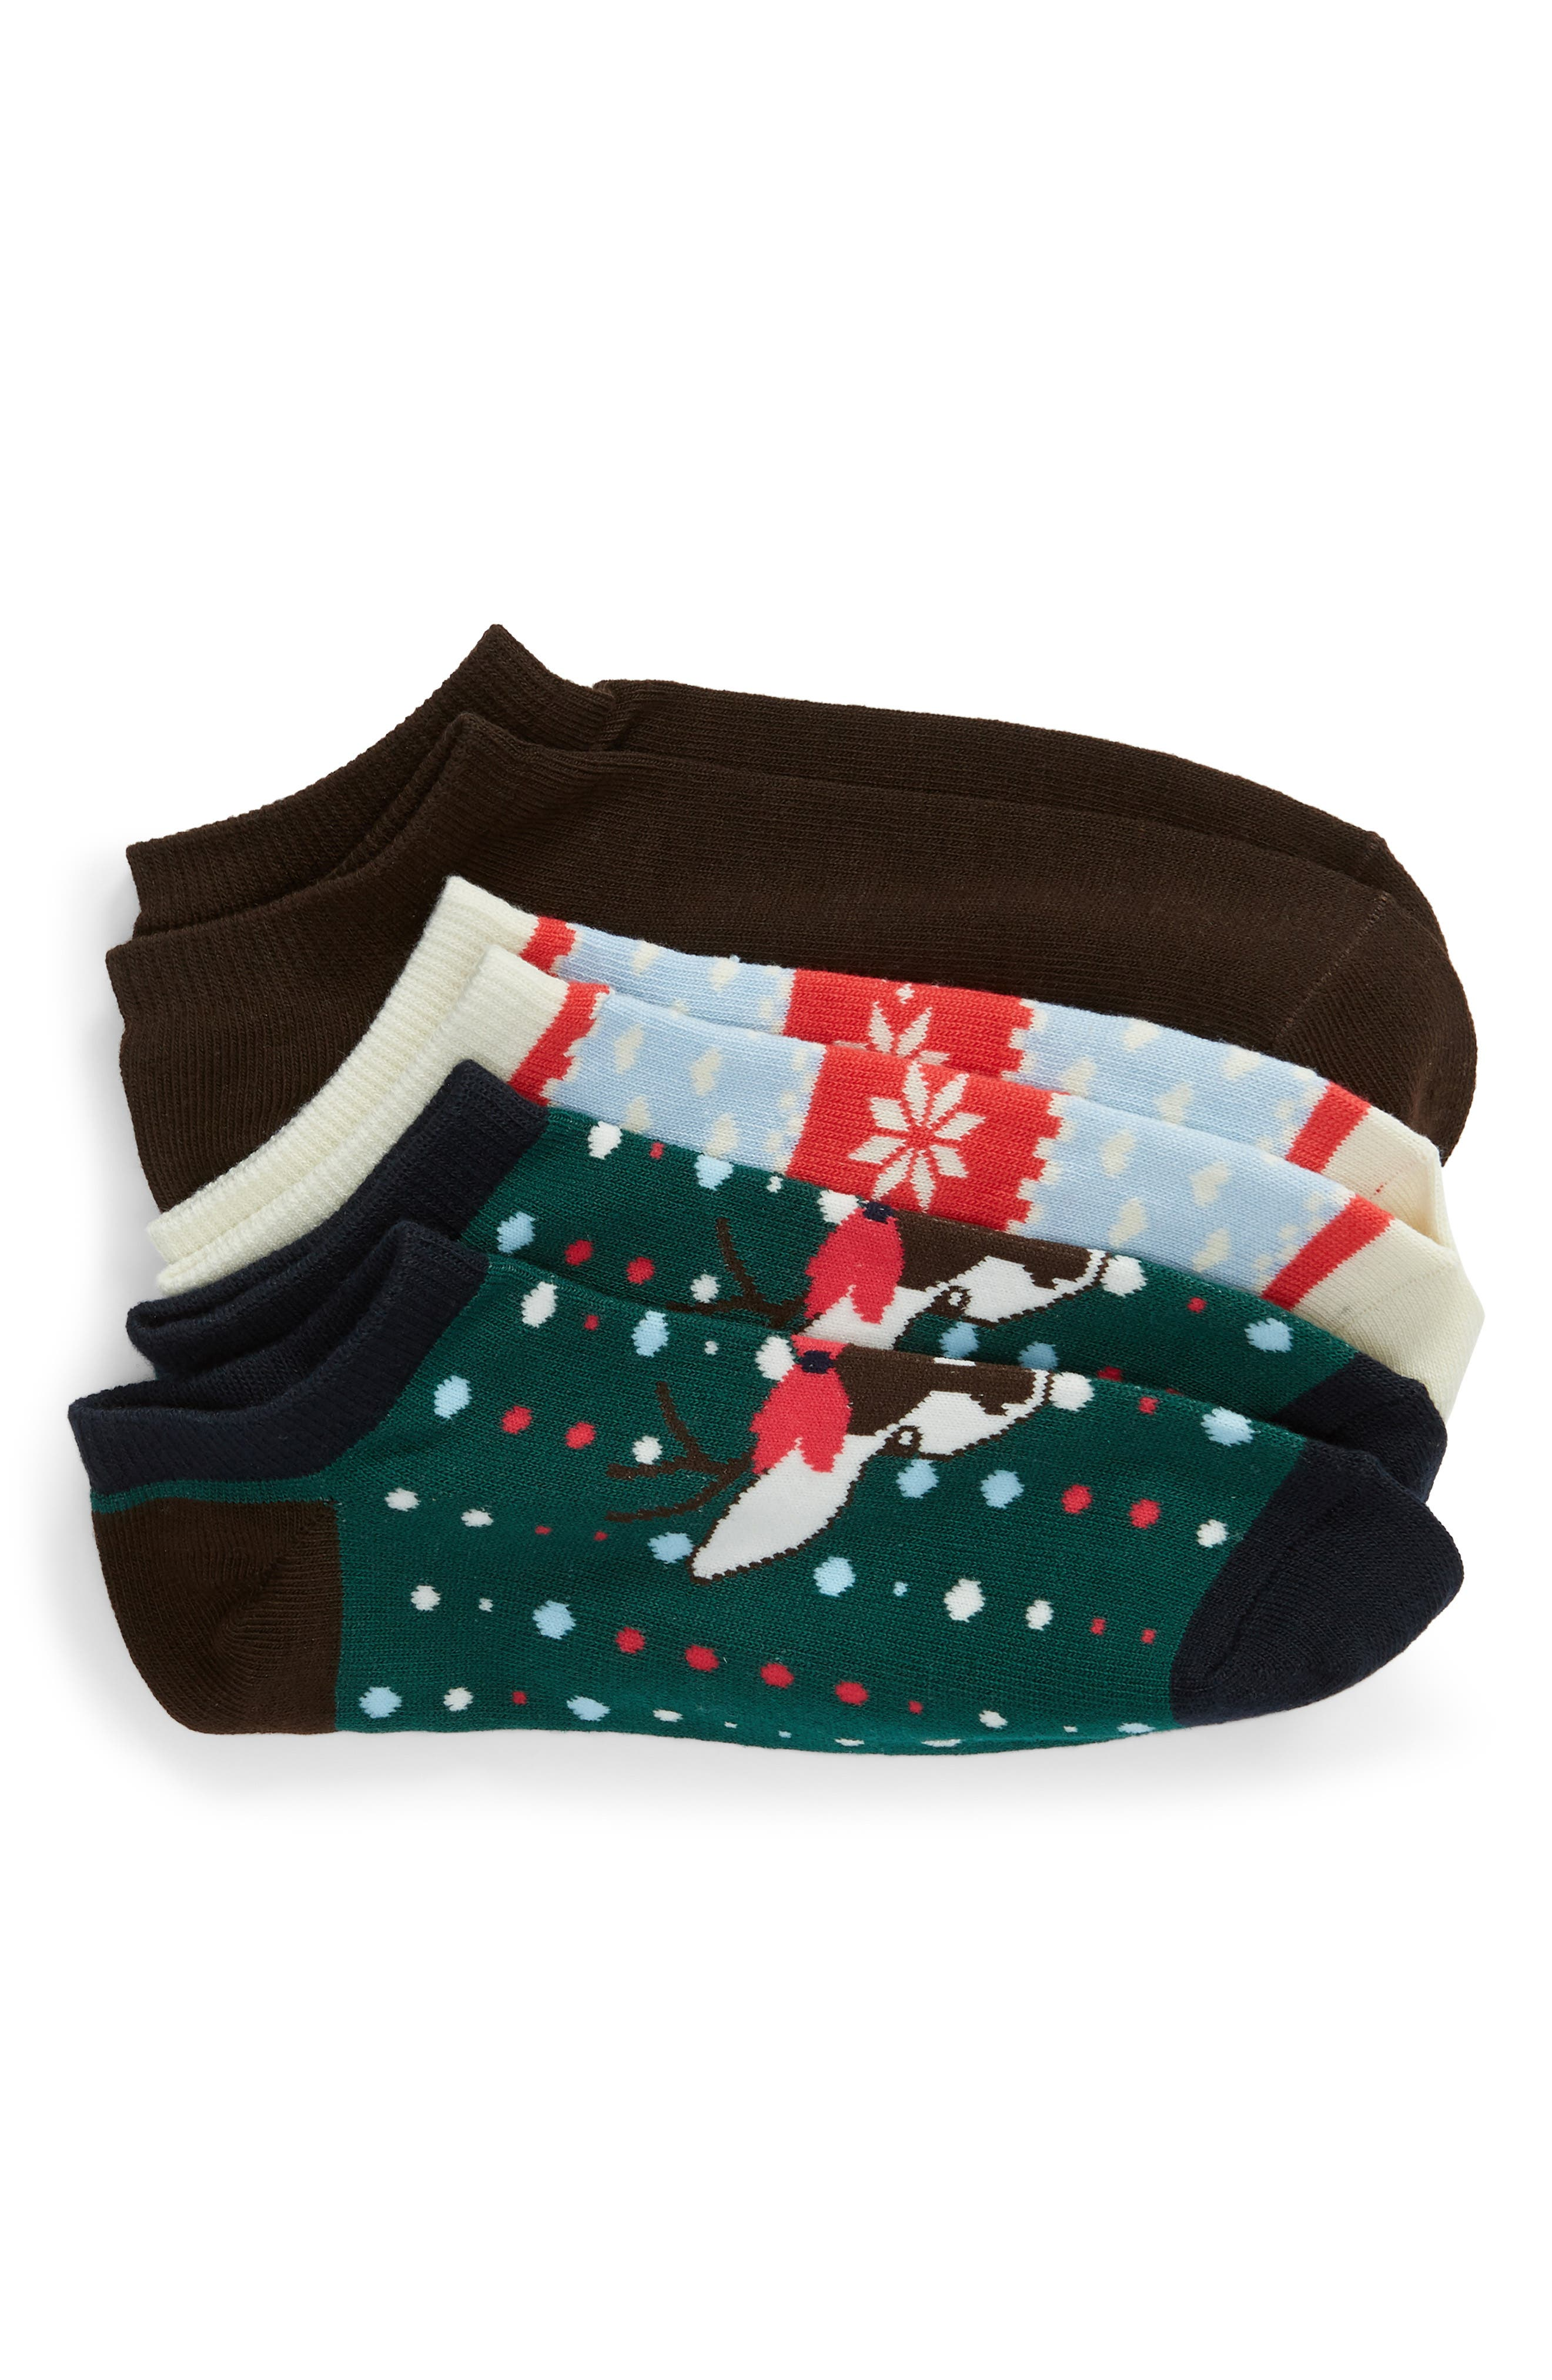 3-Pack Ankle Socks,                             Main thumbnail 1, color,                             BROWN JAVA MULTI